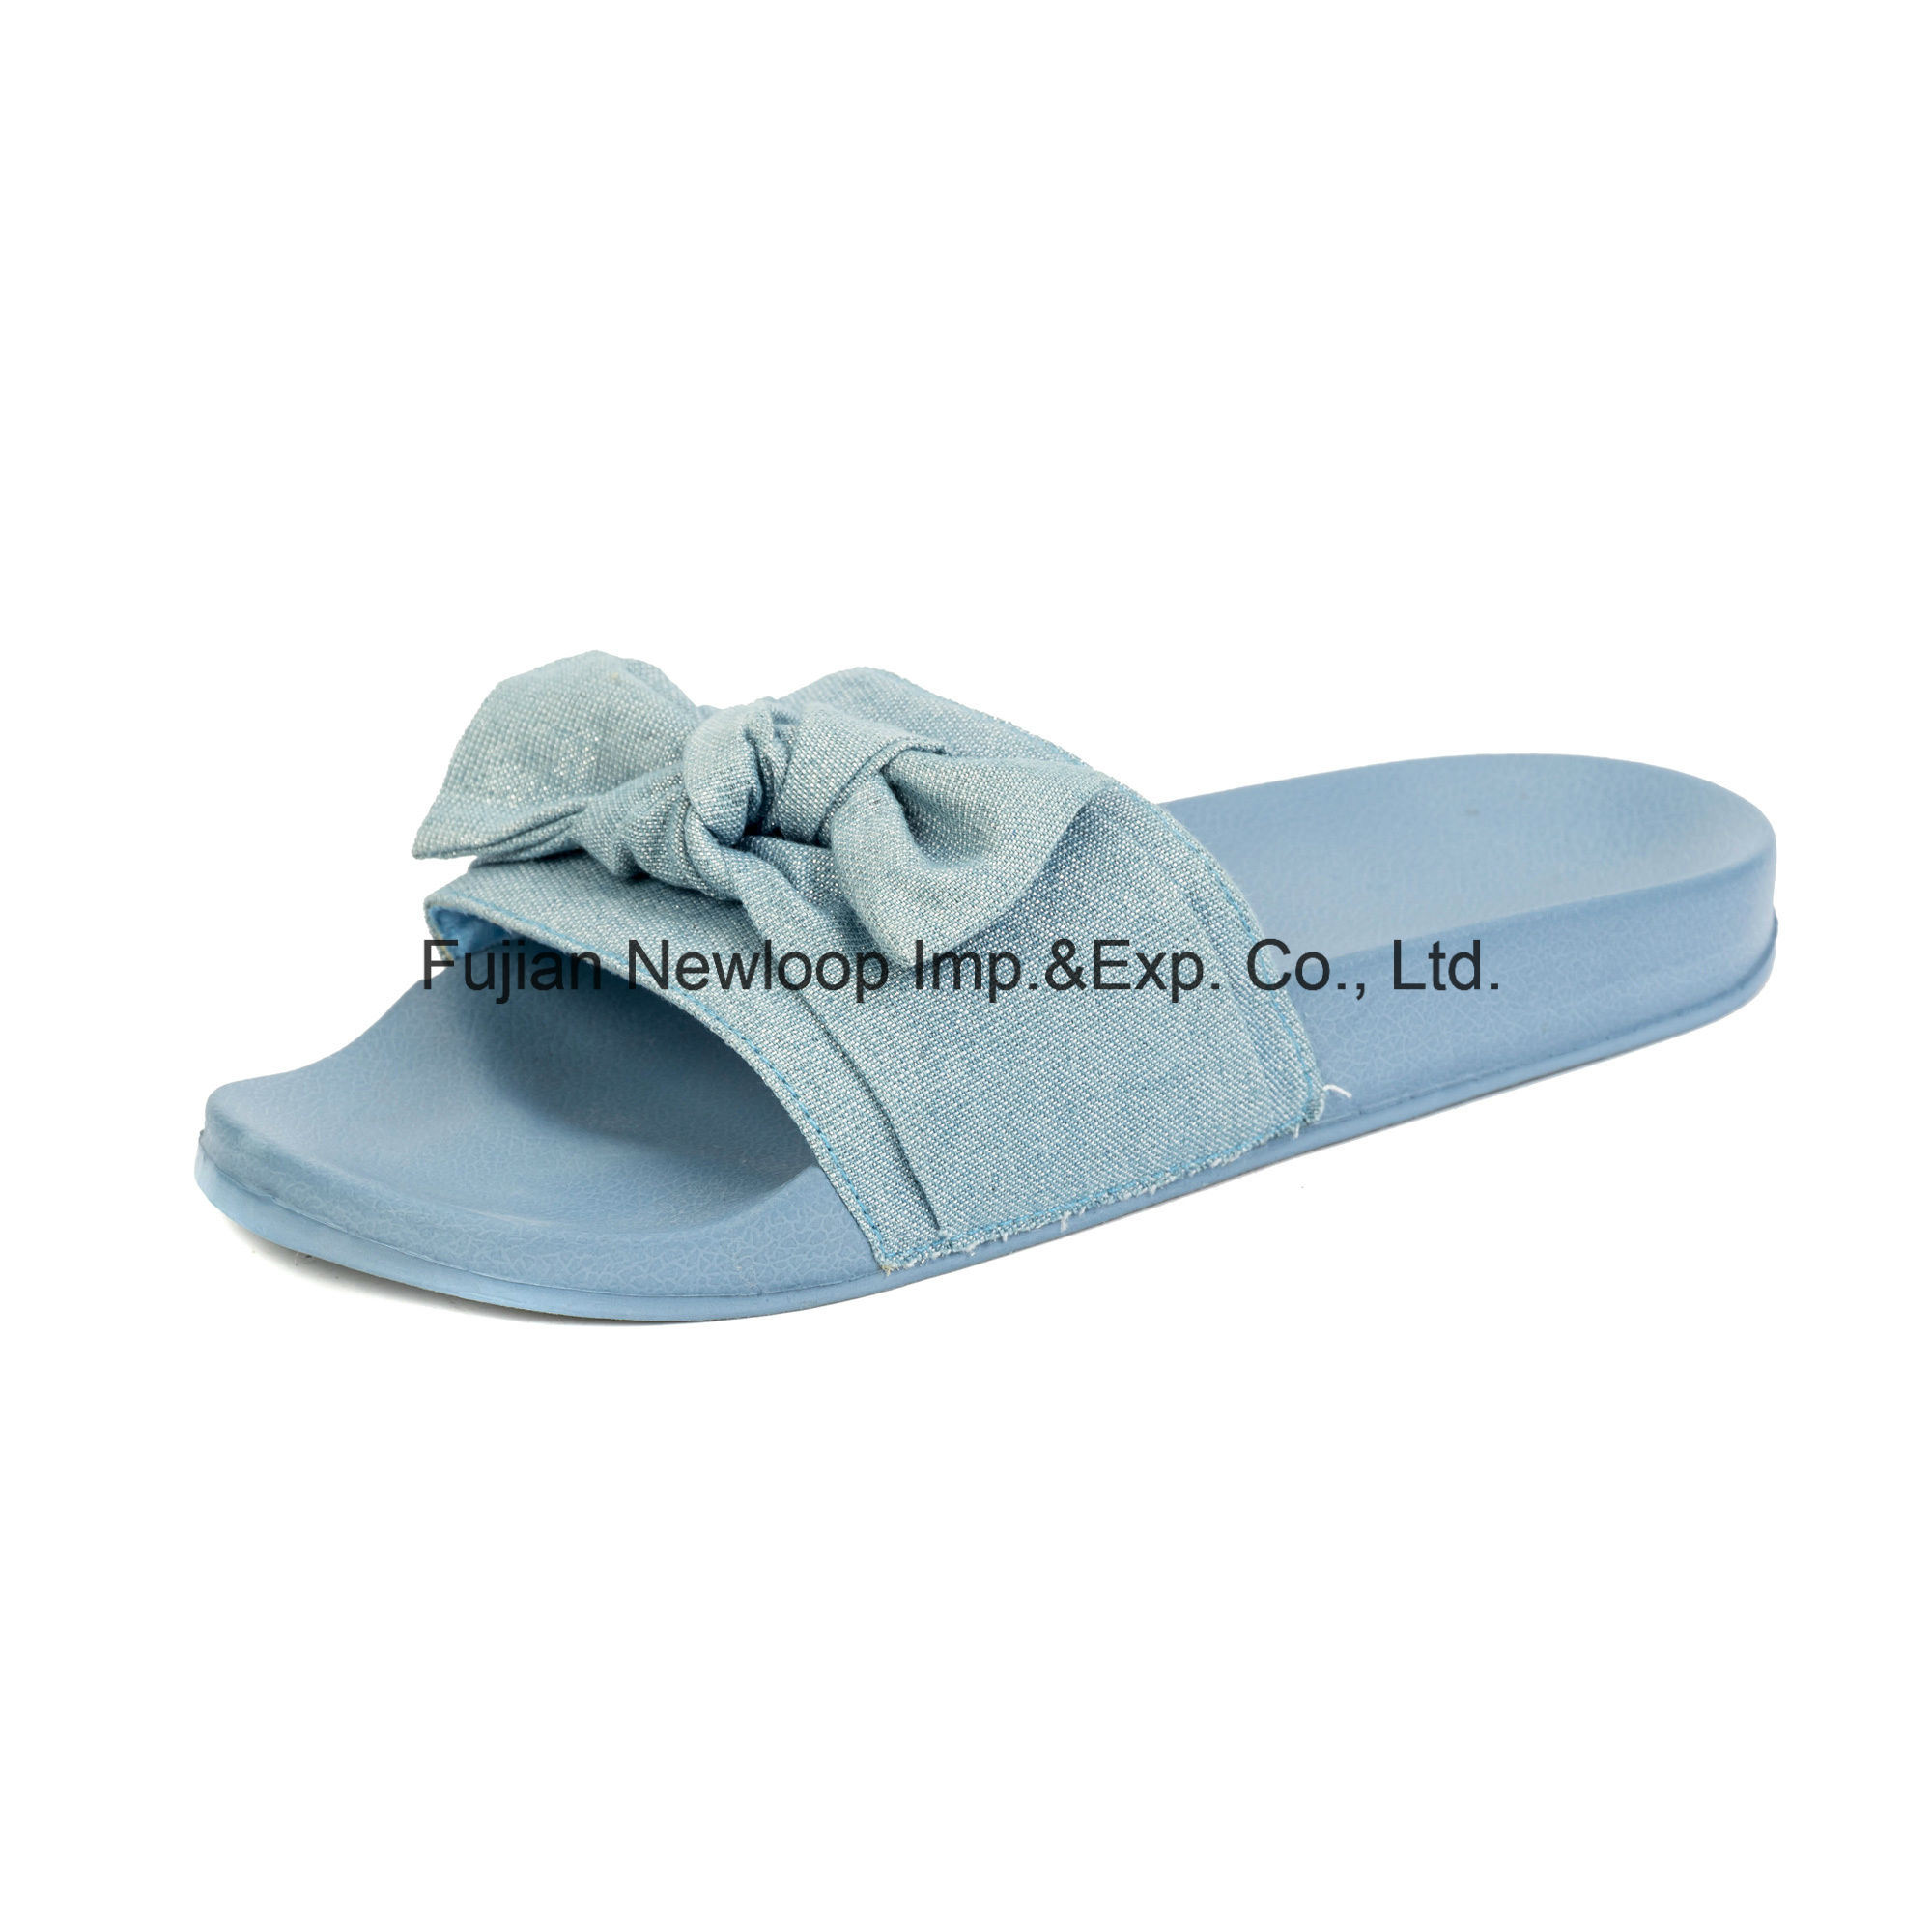 Gewebe-Segeltuch-Bogen-Knoten-Frauen-Form-Schuhe